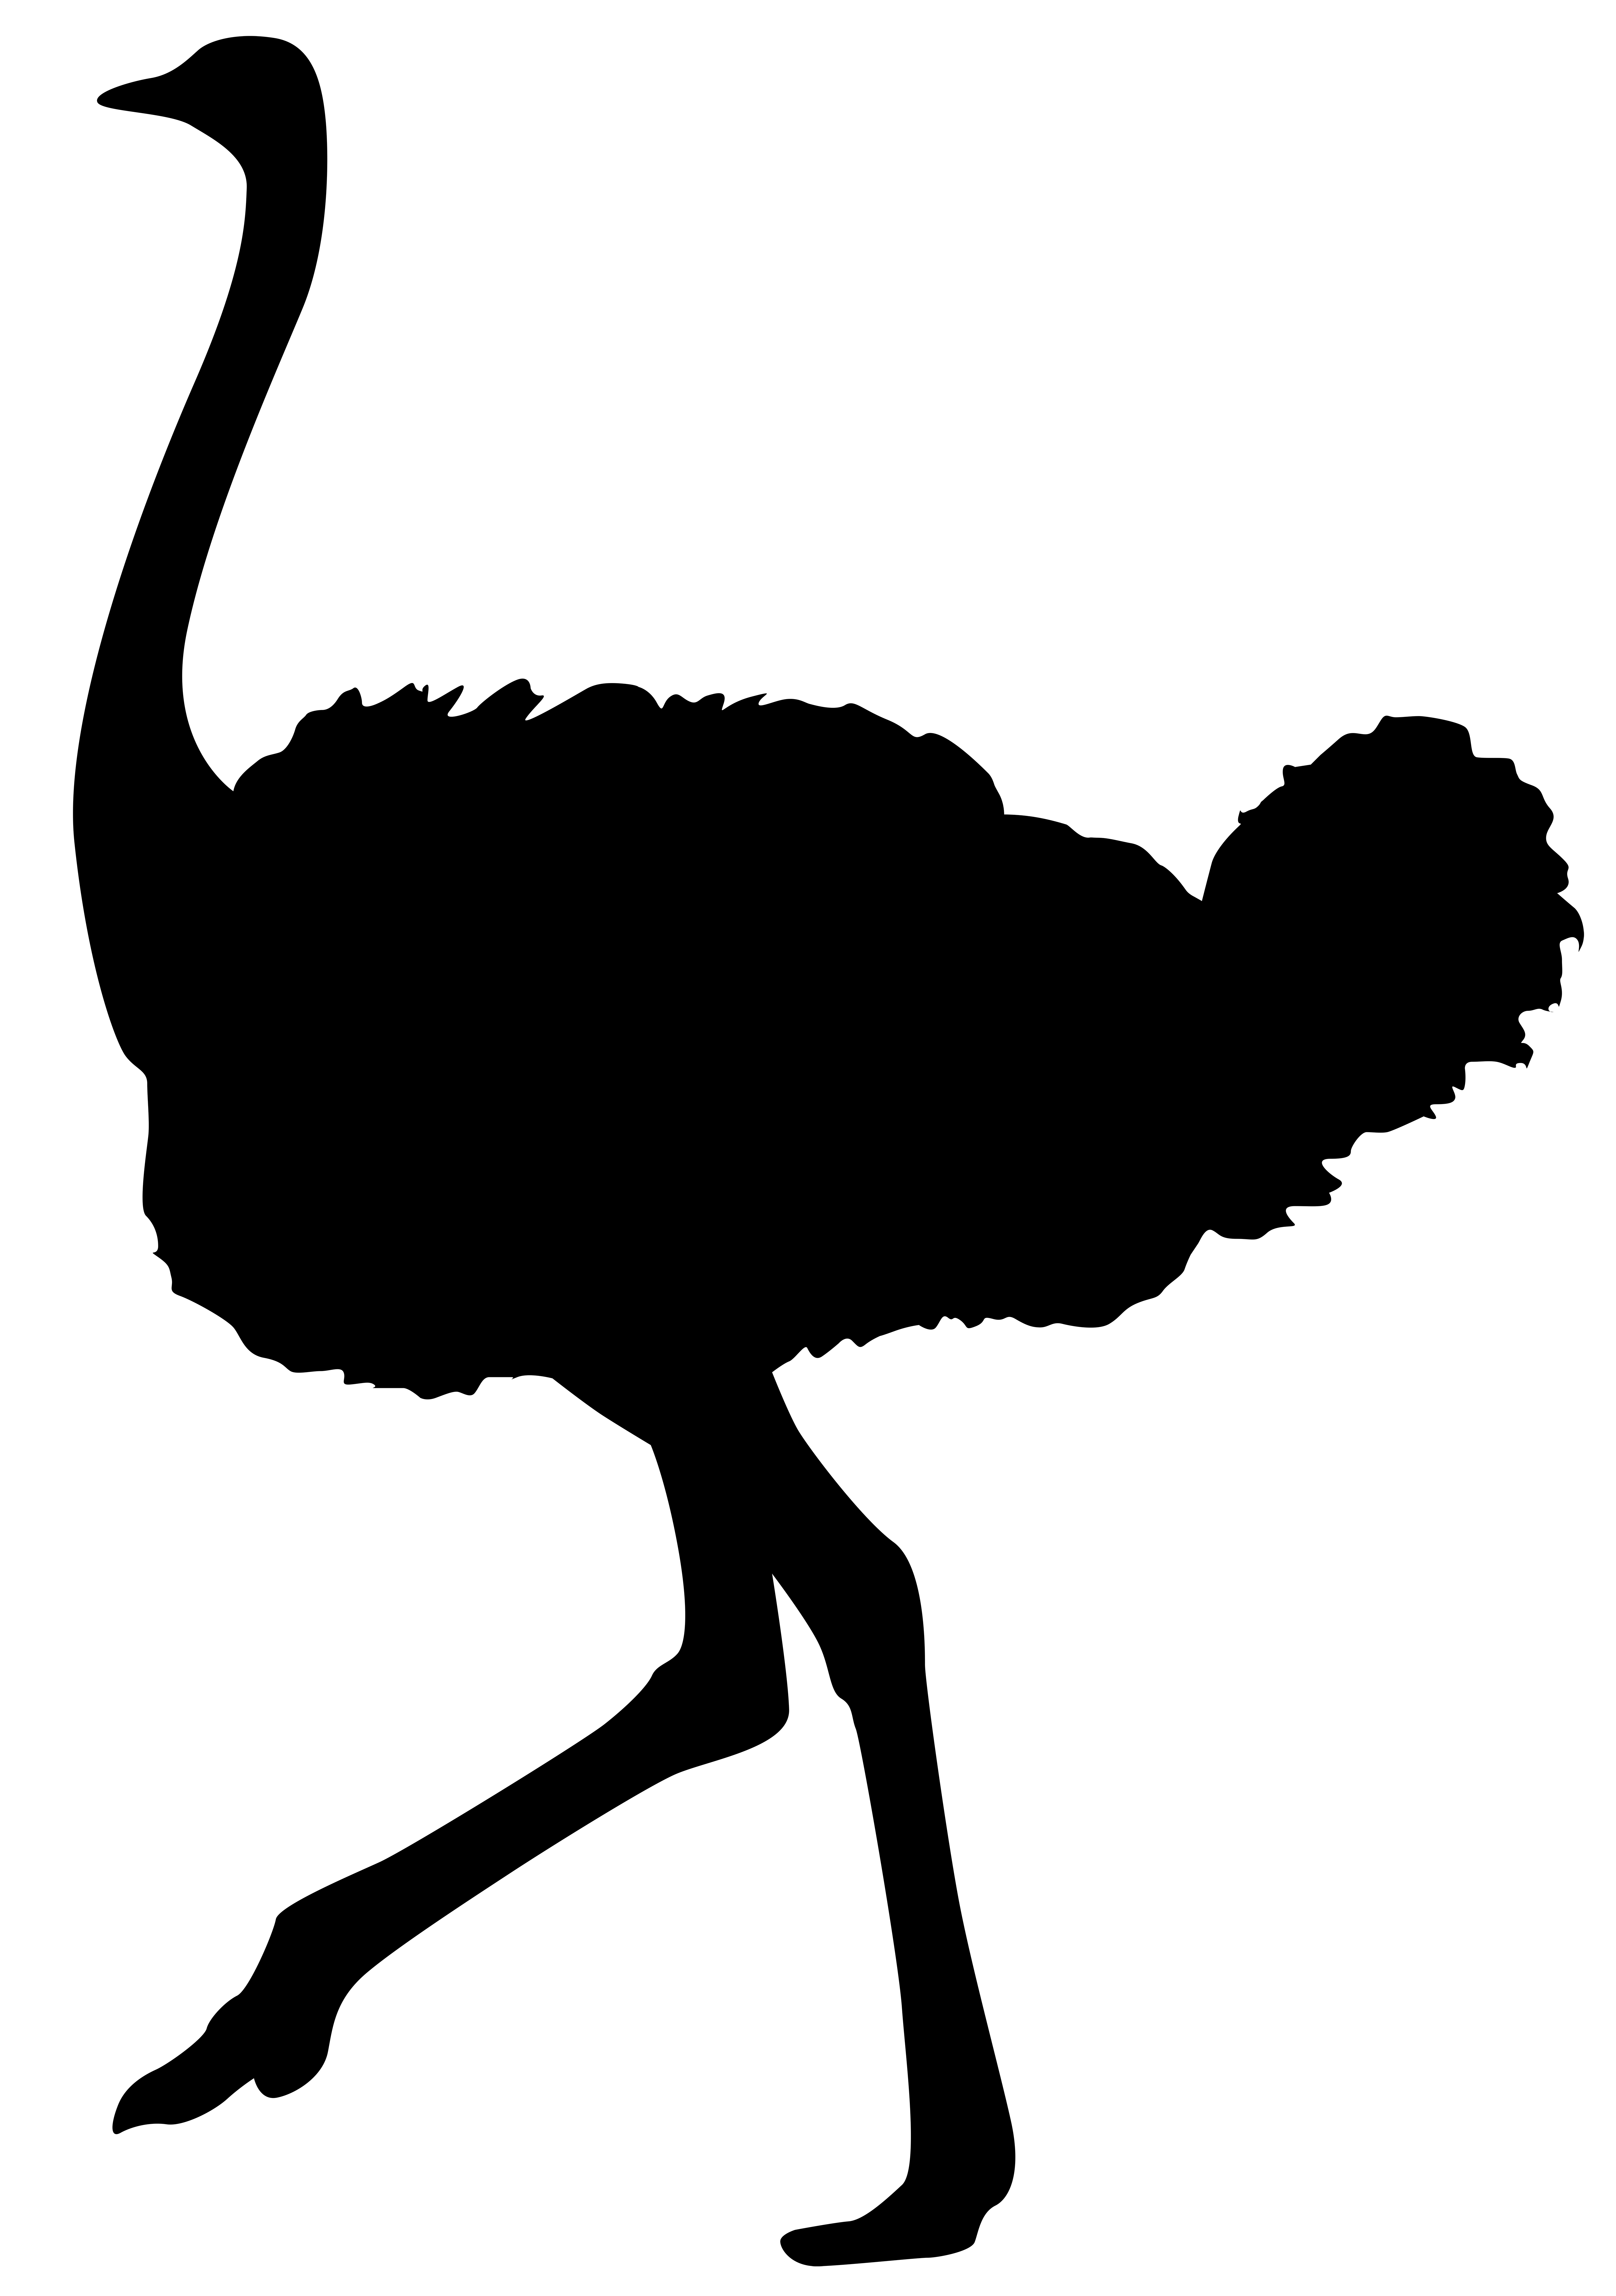 Ostrich Silhouette PNG Transparent Clip Art Image.